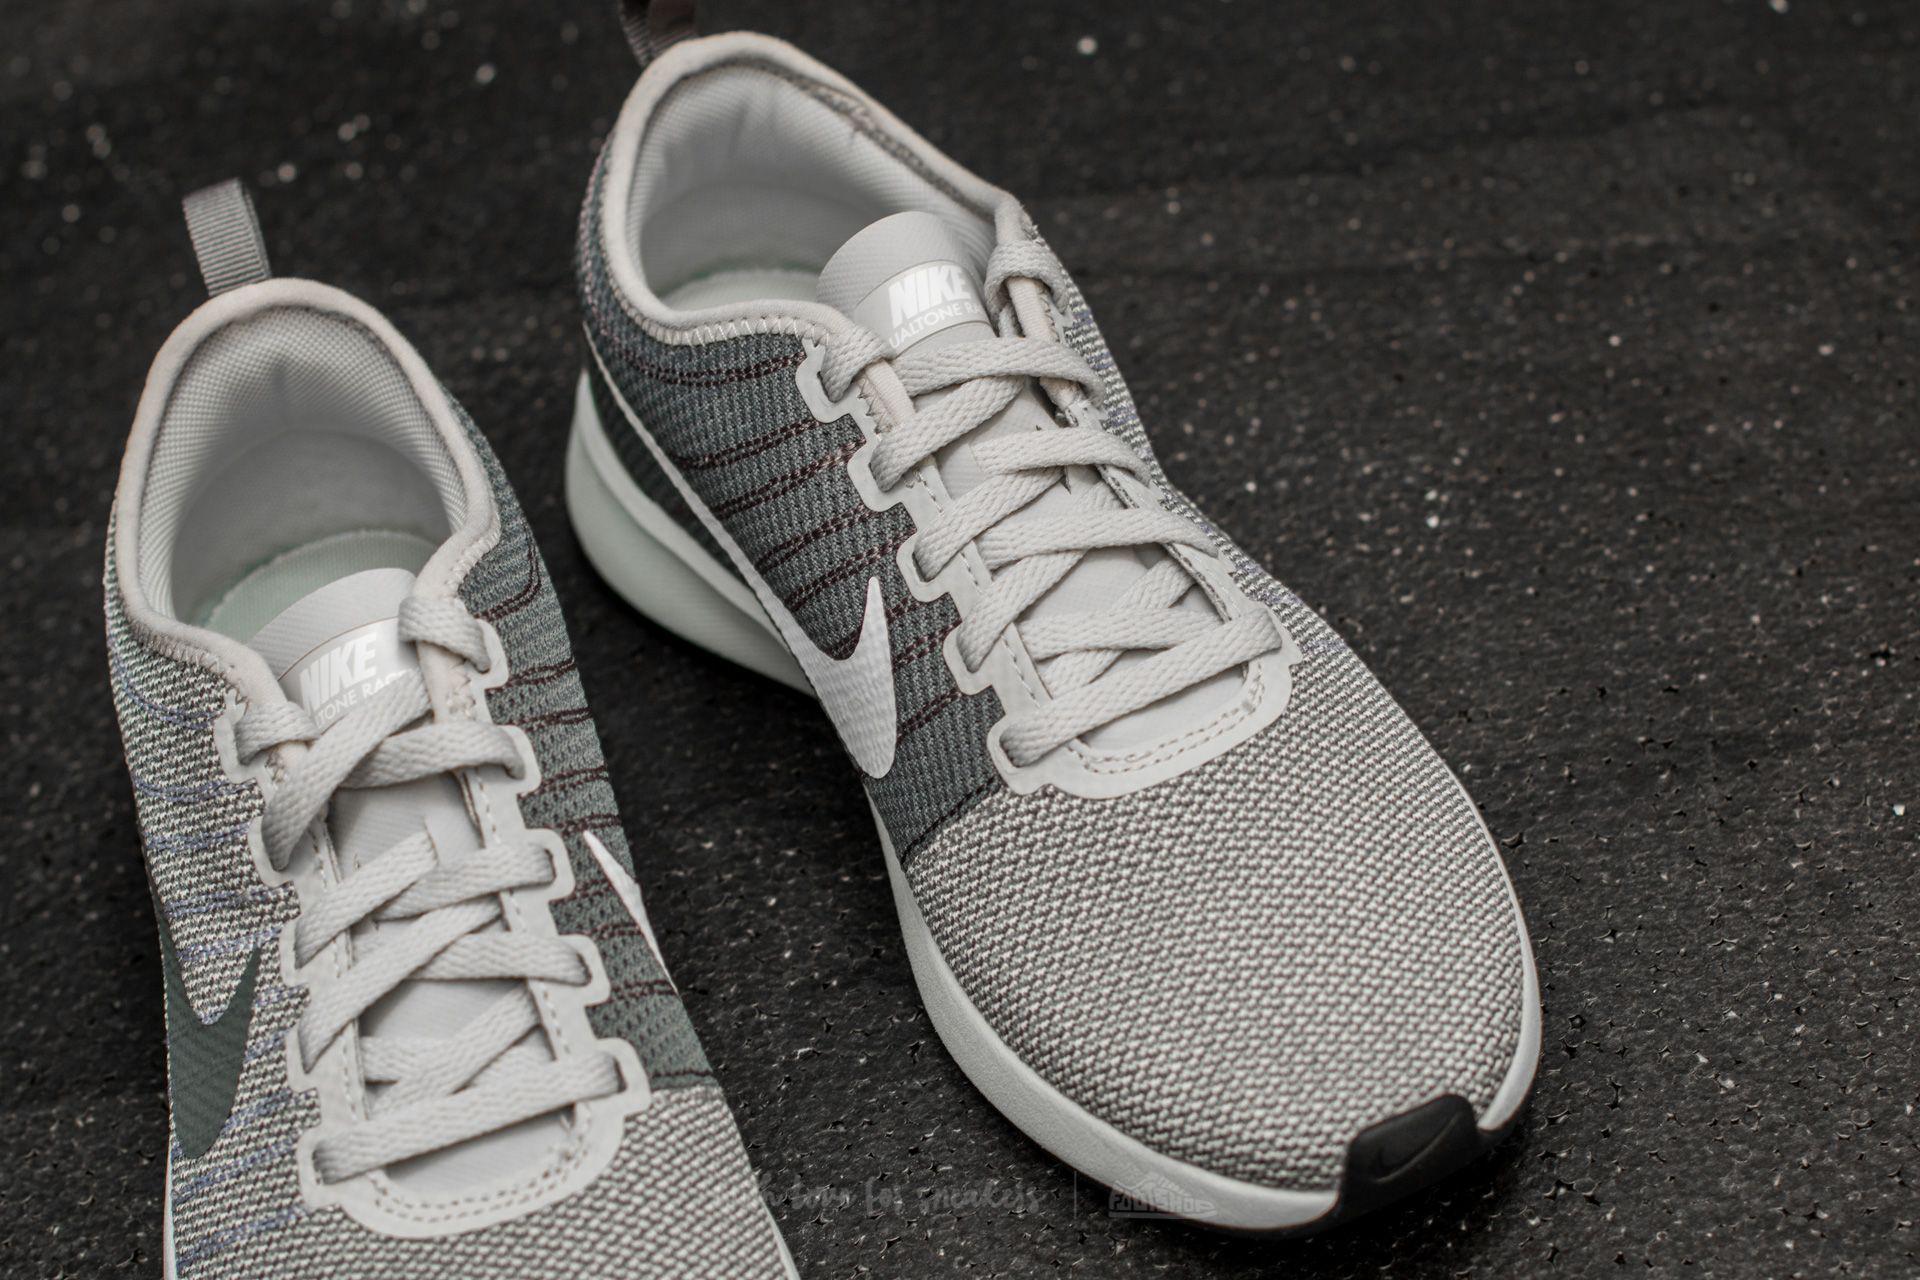 super popular edfa9 9fc65 Nike W Dualtone Racer Light Bone/ White-dark Grey in Gray - Lyst